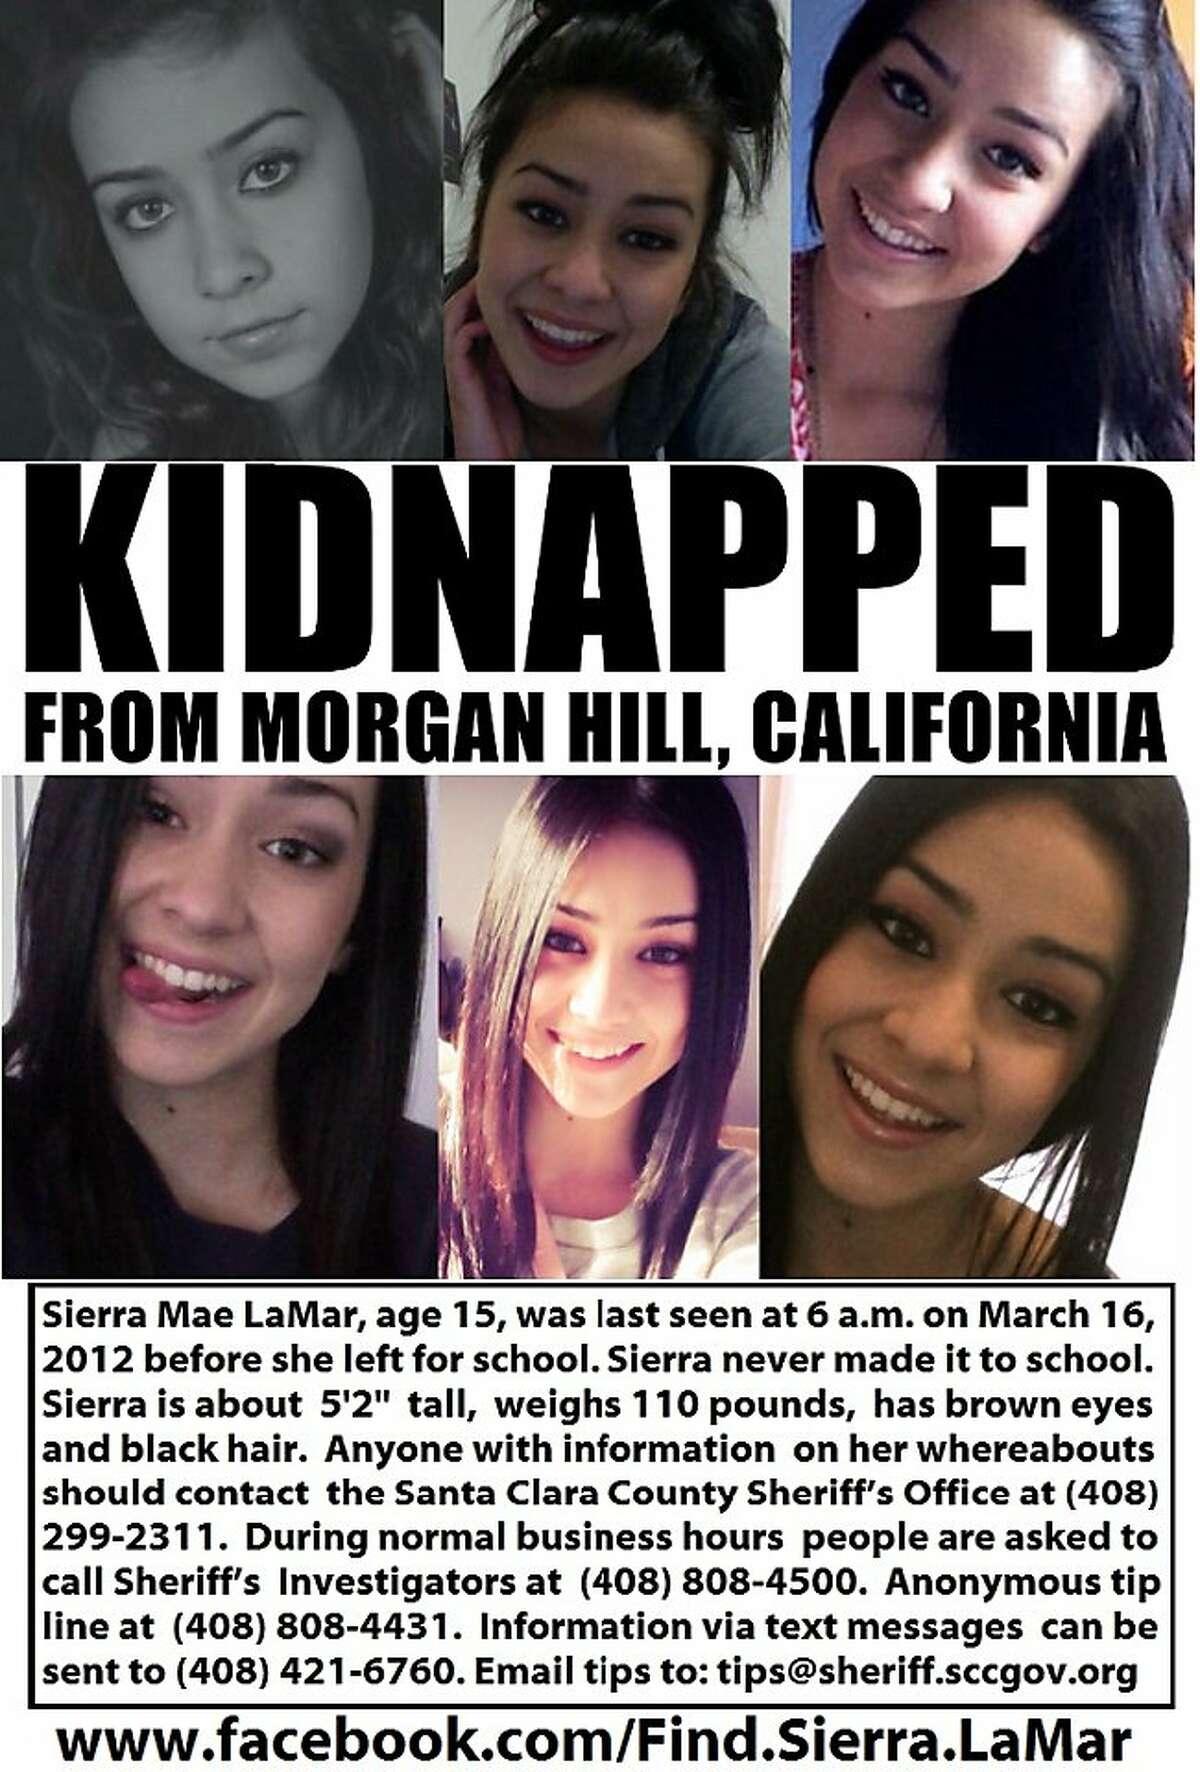 Sierra LaMar is missing from her home near Morgan Hill.